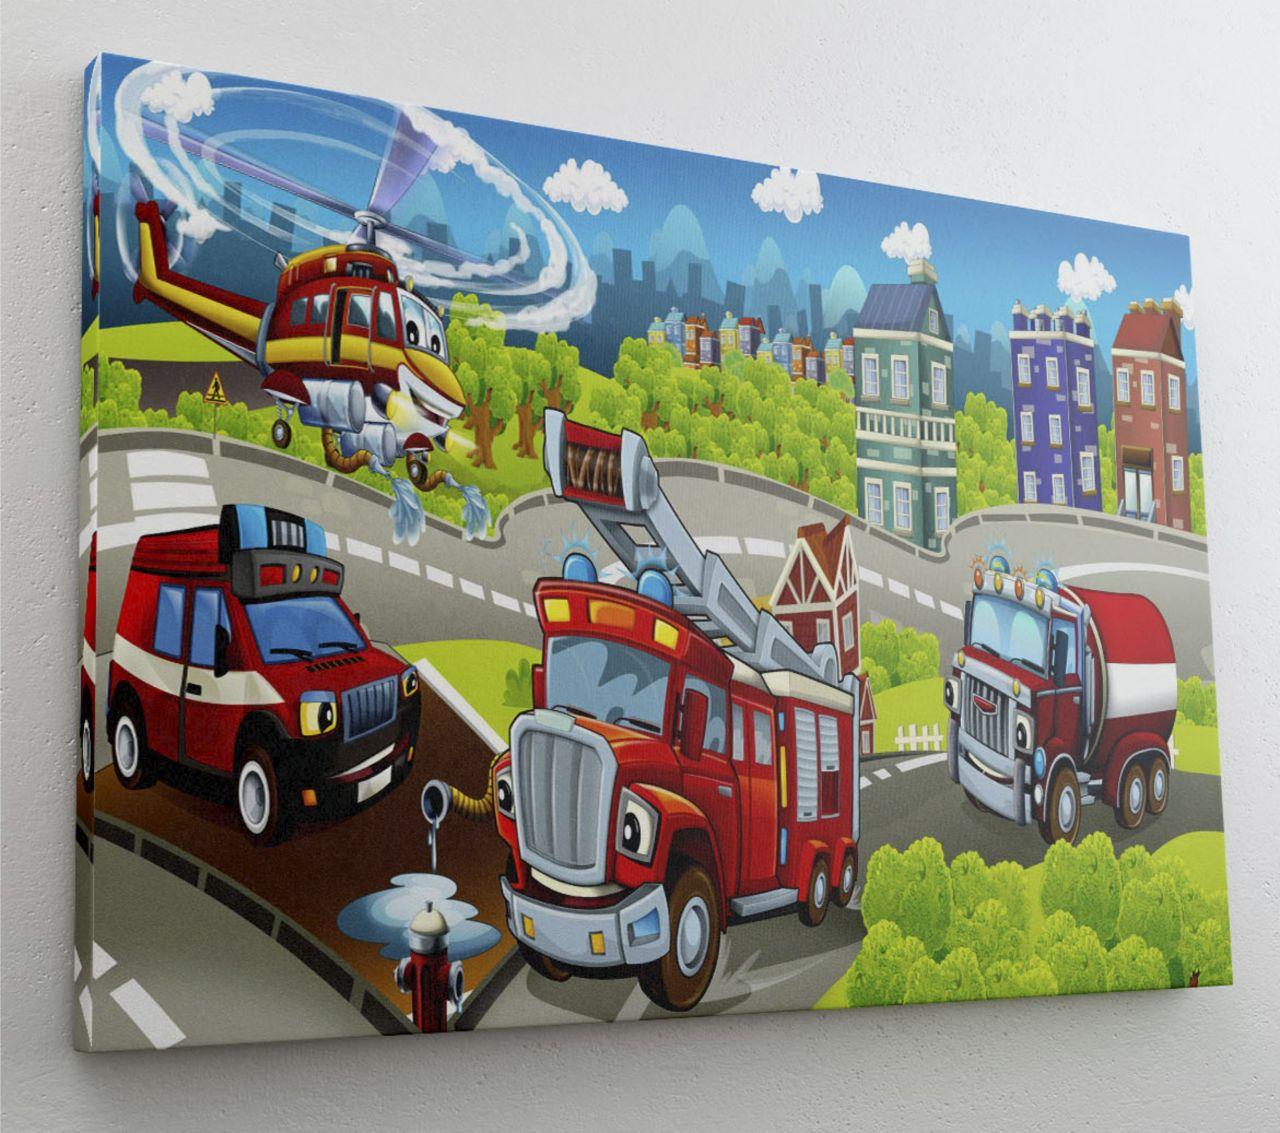 Full Size of Wandbild Kinderzimmer 5d421efa1859c Wandbilder Wohnzimmer Regal Weiß Regale Sofa Schlafzimmer Kinderzimmer Wandbild Kinderzimmer